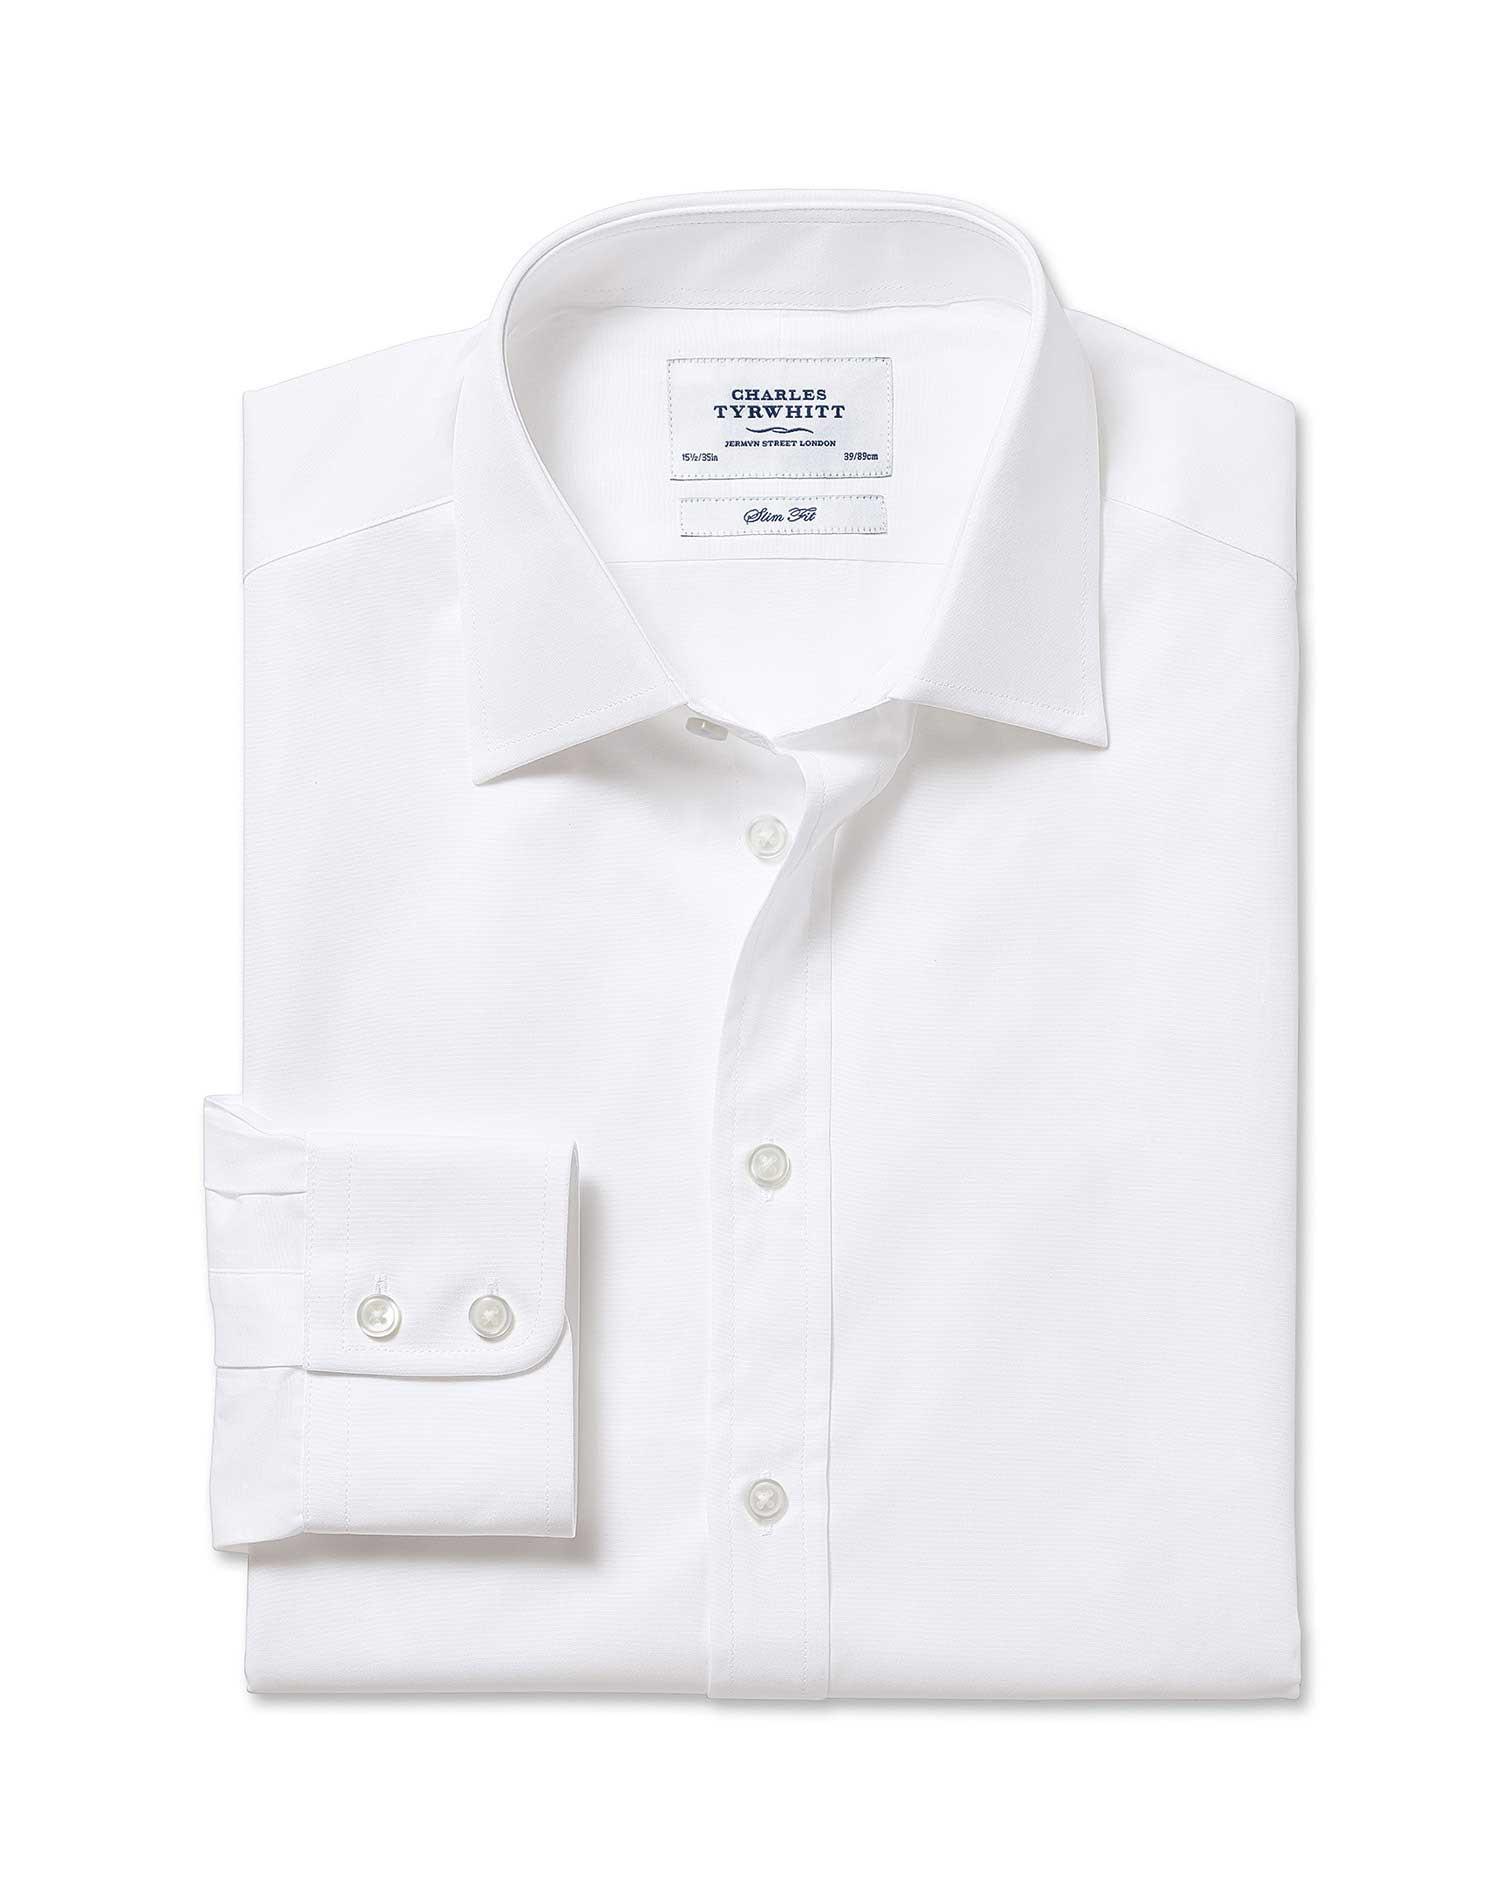 Extra Slim Fit Egyptian Cotton Poplin White Formal Shirt Single Cuff Size 16/35 by Charles Tyrwhitt